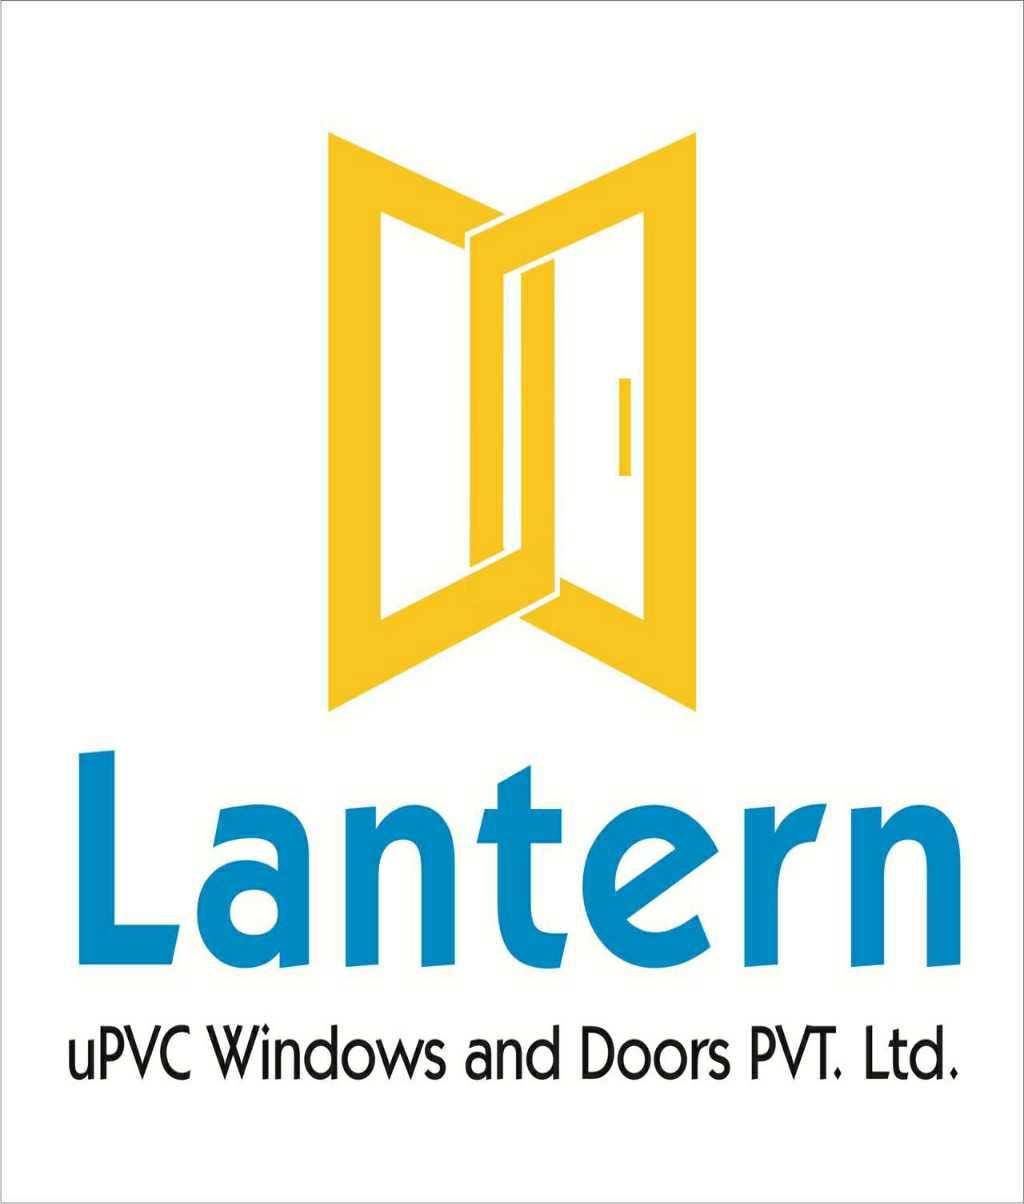 Lantern UPVC & Doors Pvt. Ltd.